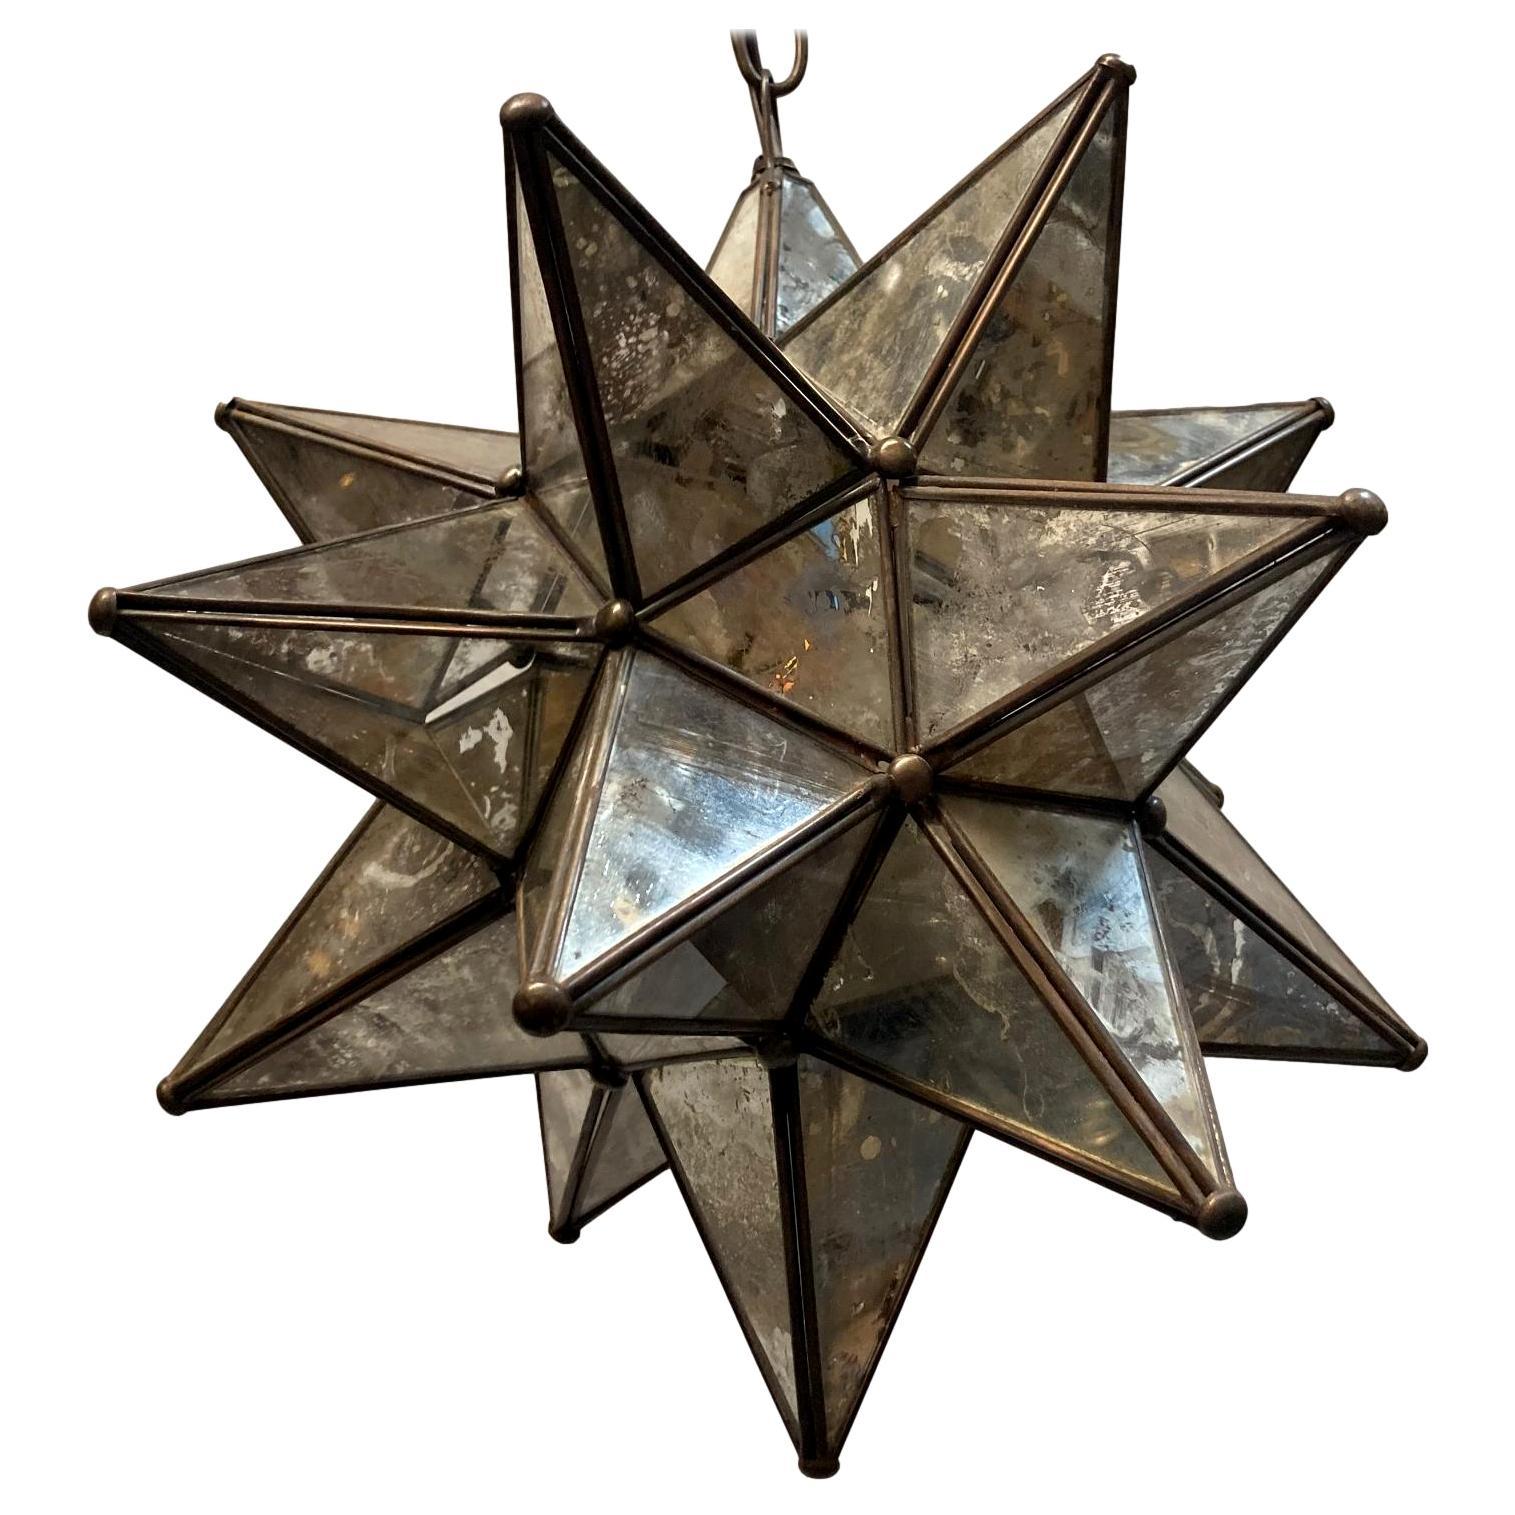 Midcentury Star Shaped Light Fixture